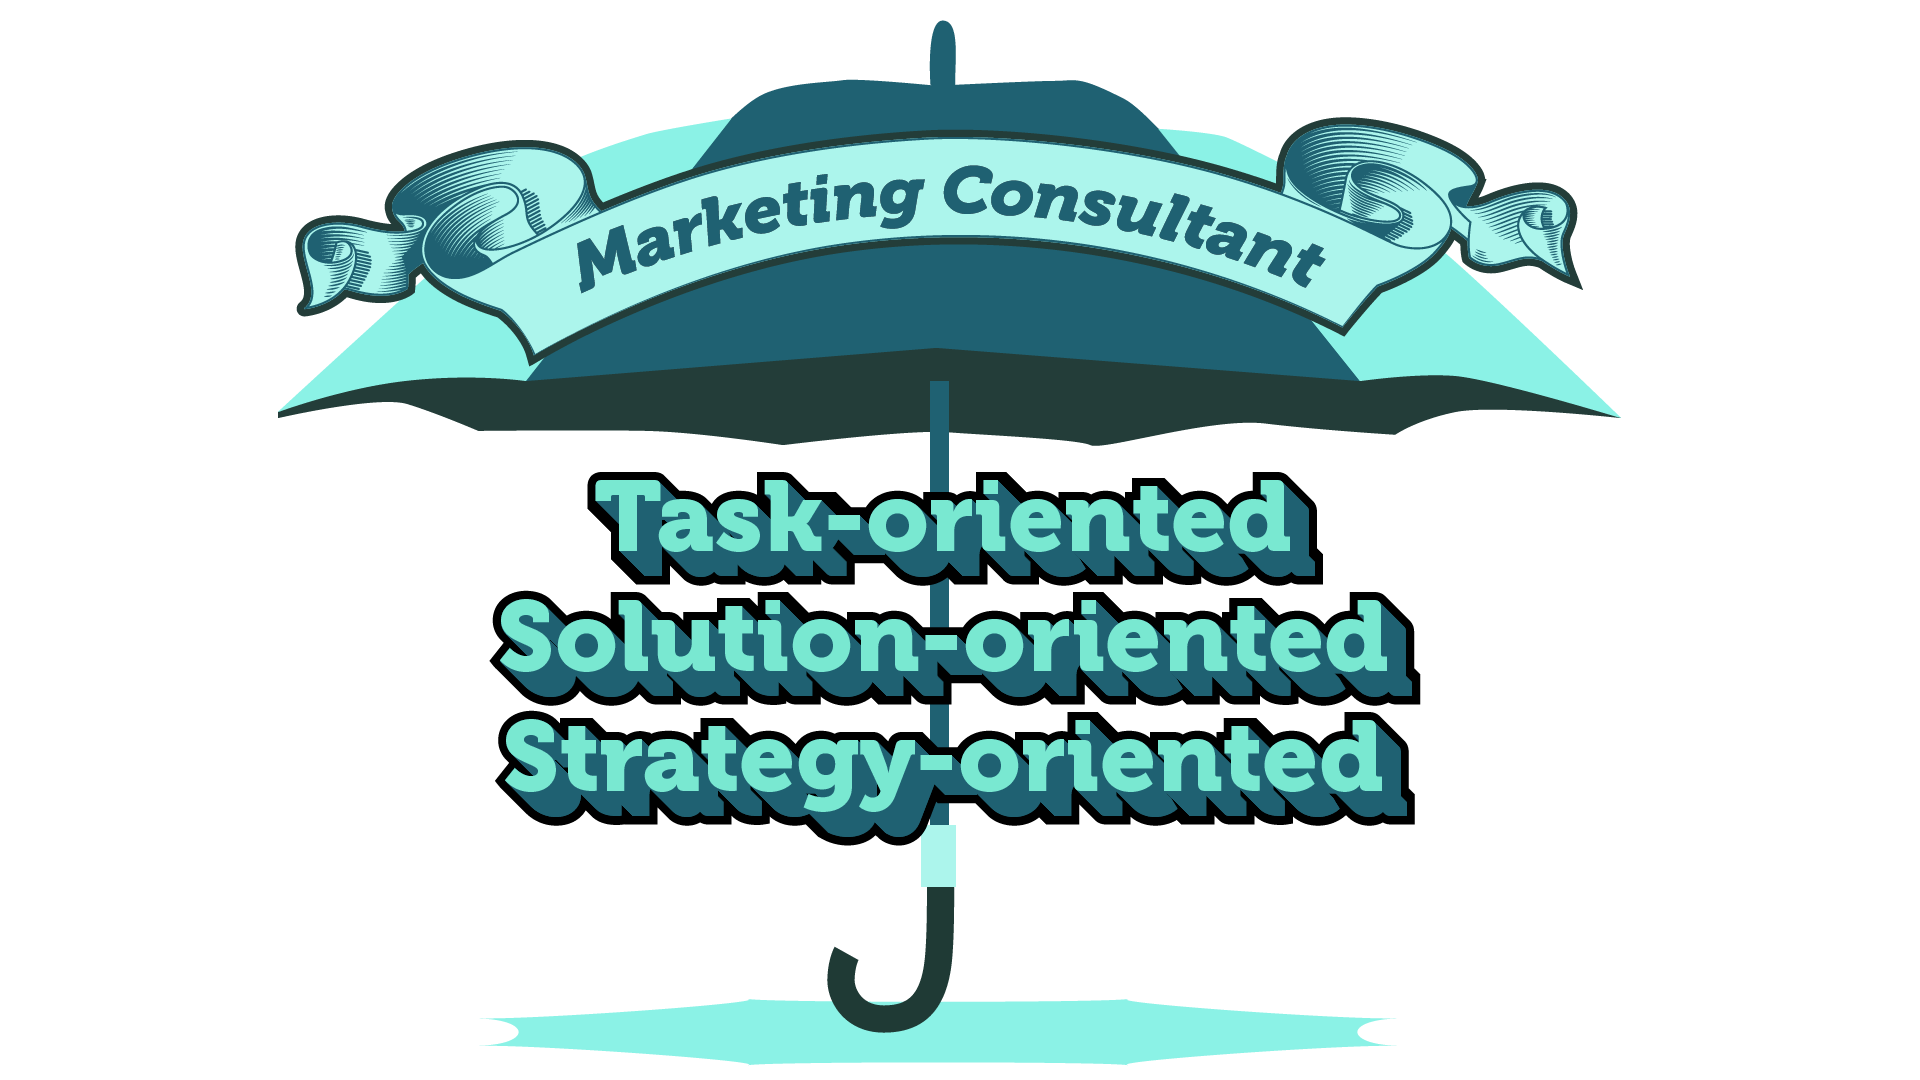 IMAGE: Marketing Consultant is an umbrella term